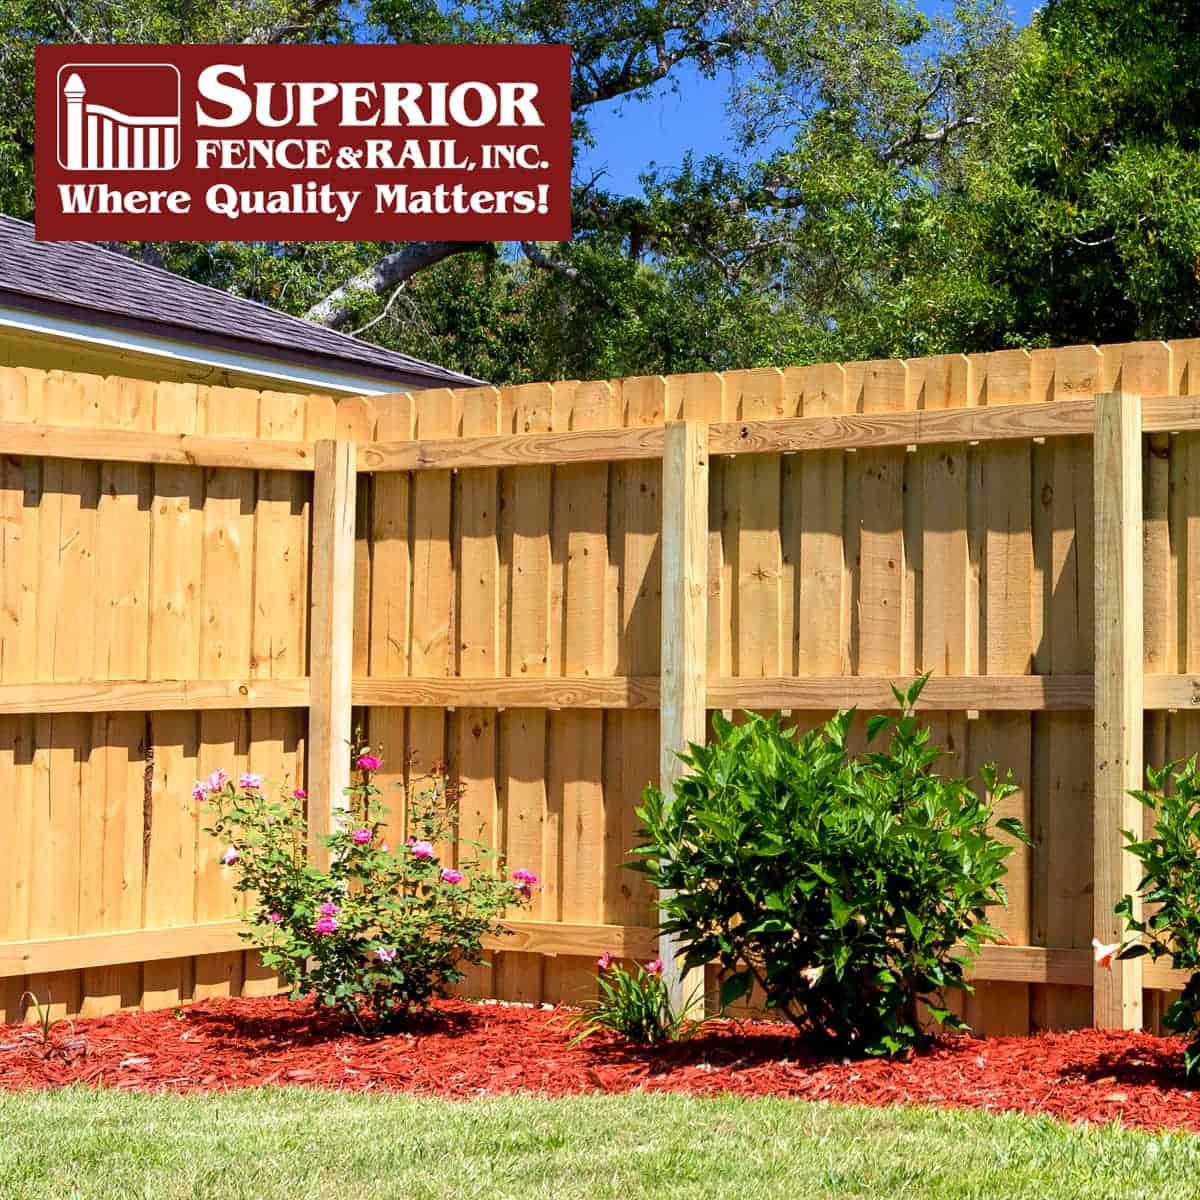 Cherry creek fence company contractor